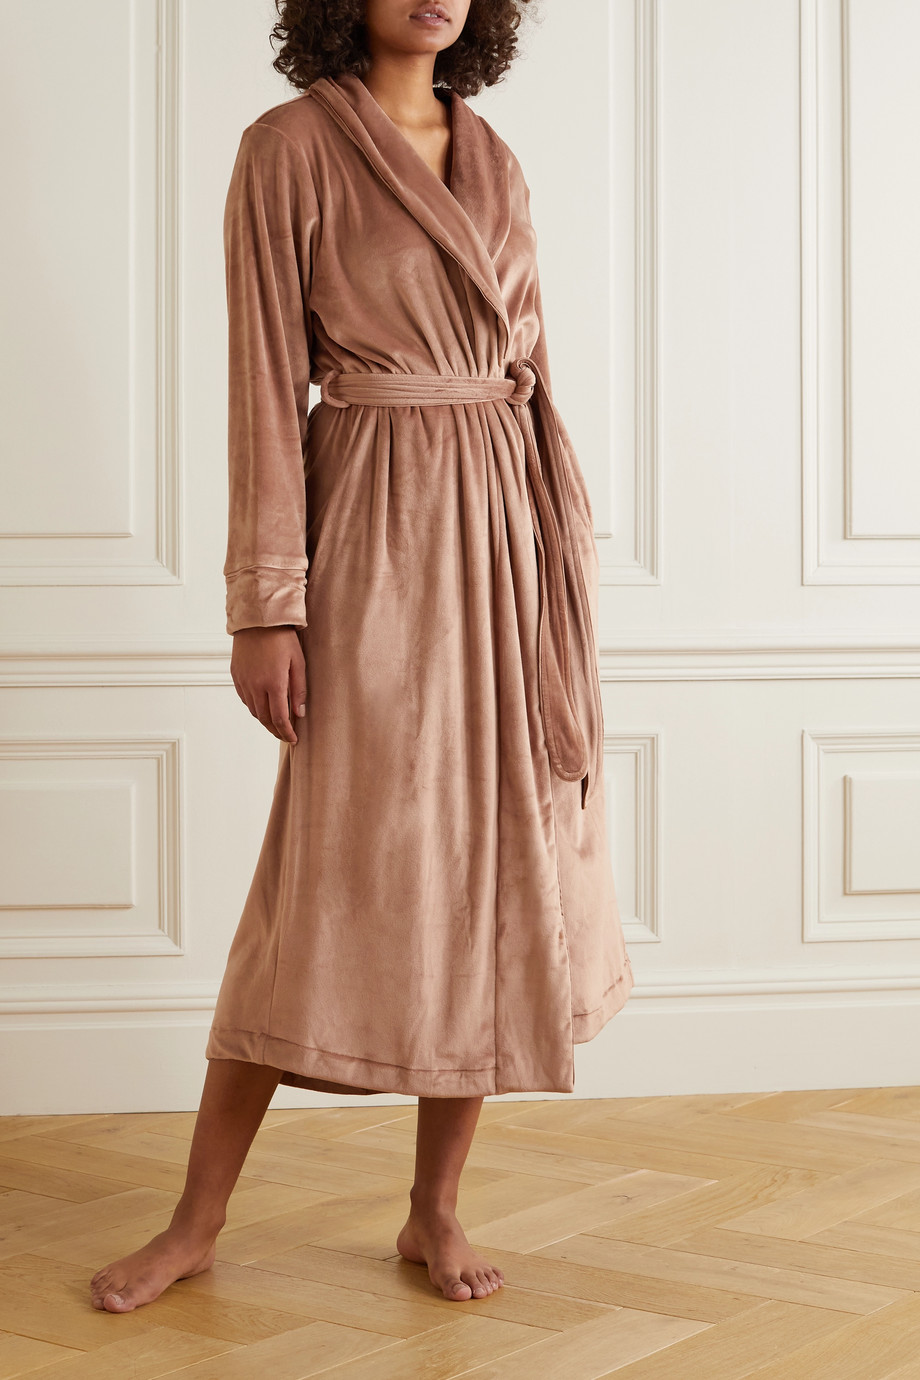 SKIMS Velour Long Robe – Sienna – Morgenmantel aus Velours